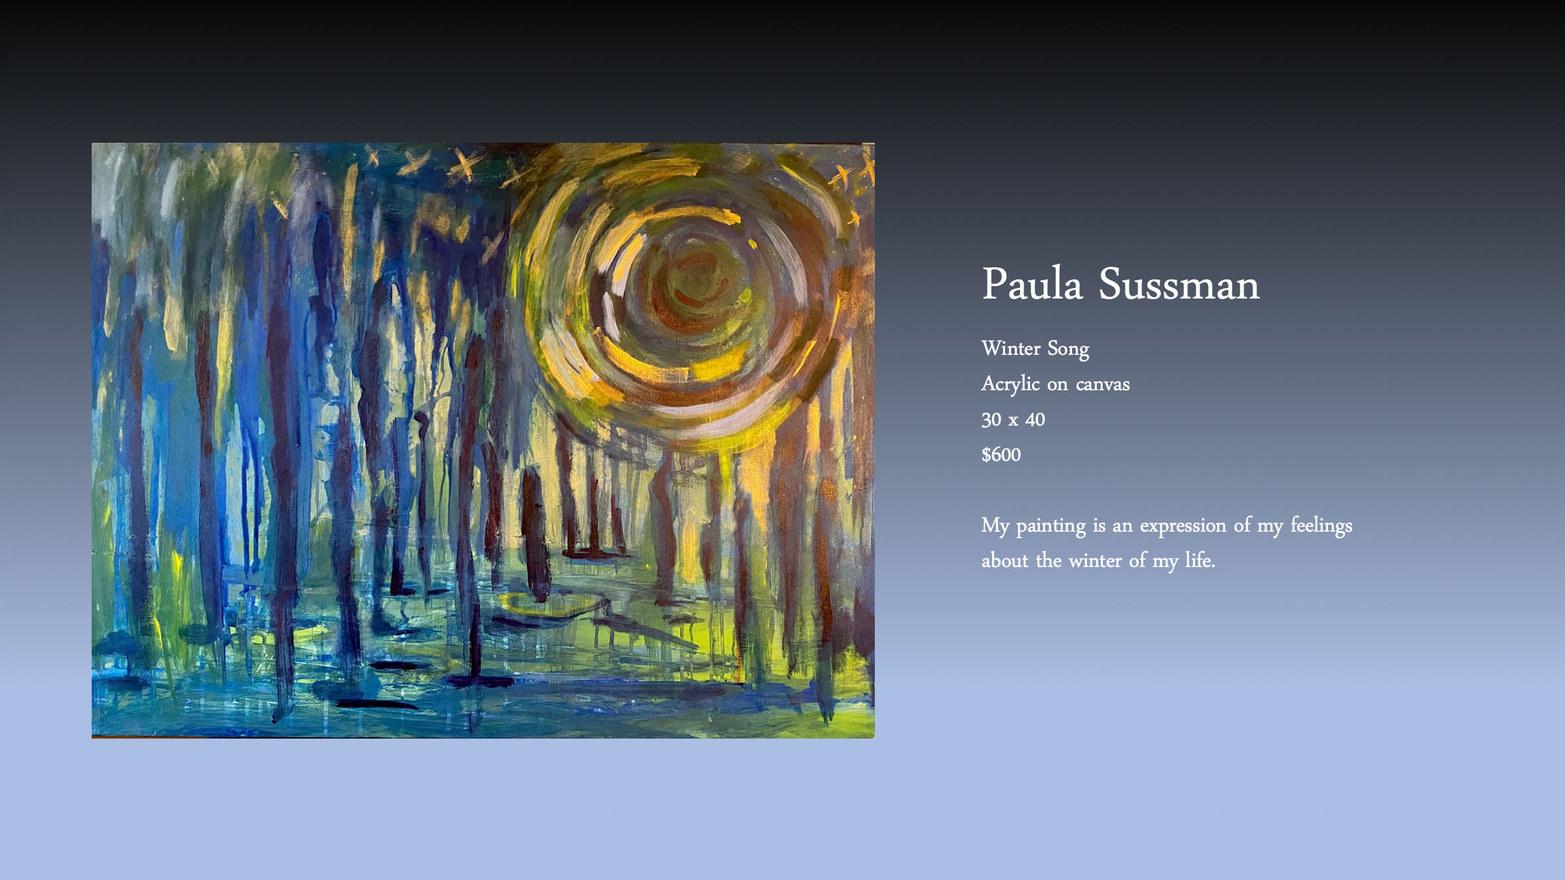 Paula Sussman